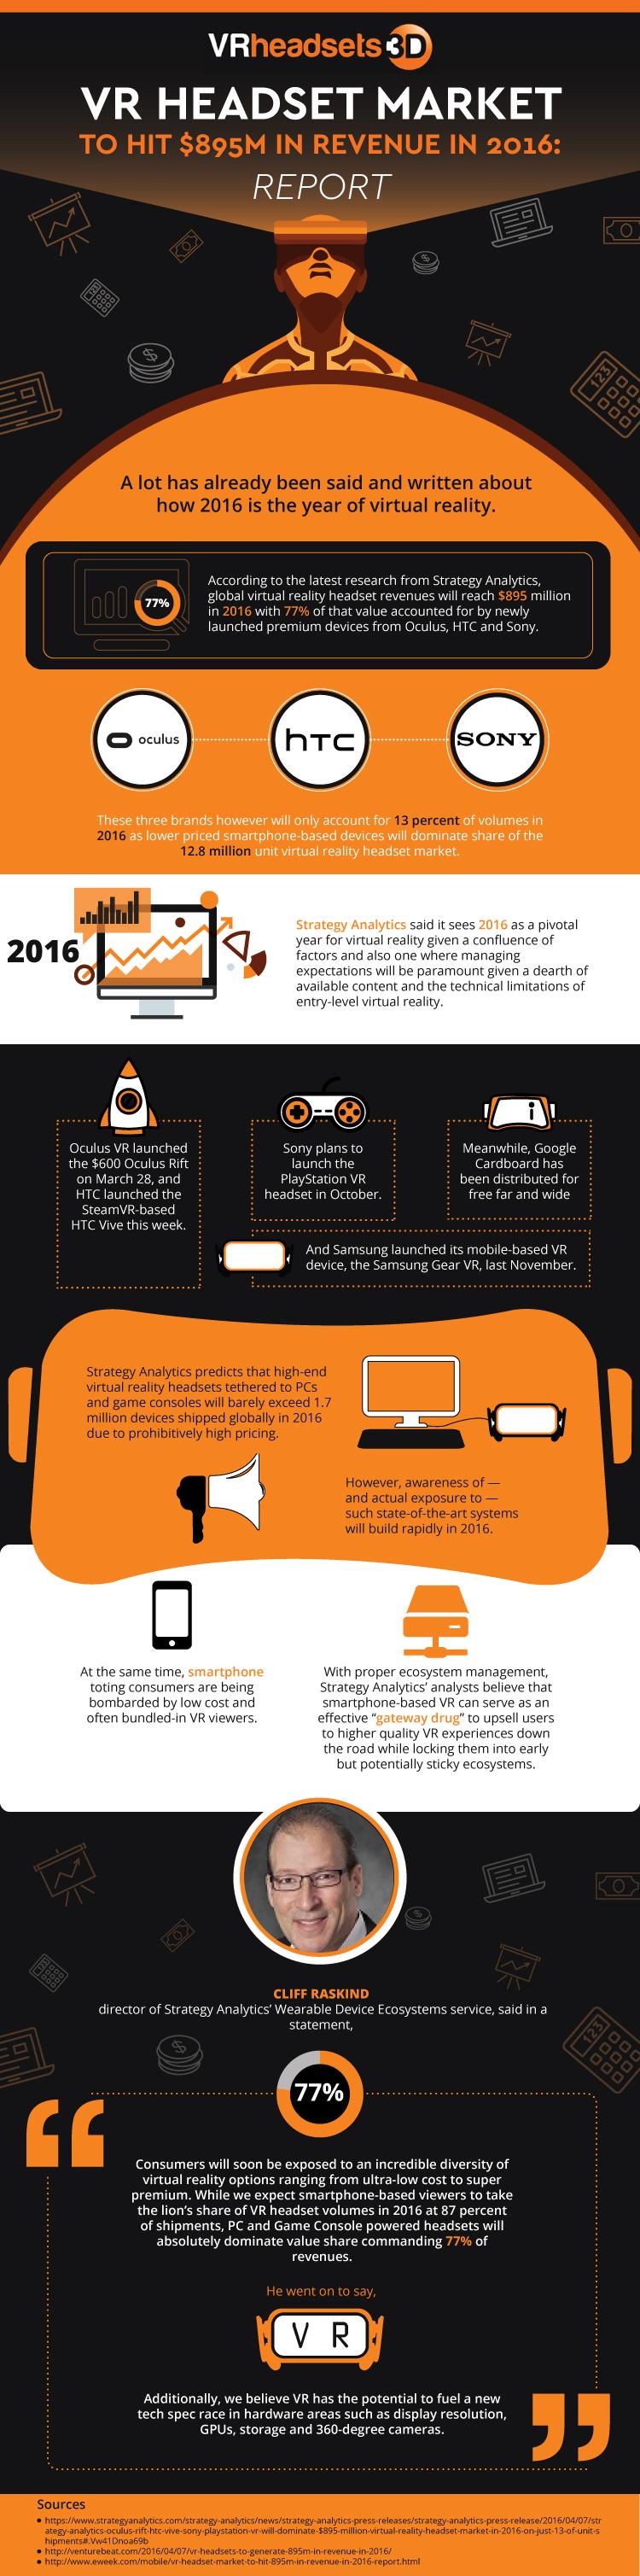 VR-Headset-Market-Report-2